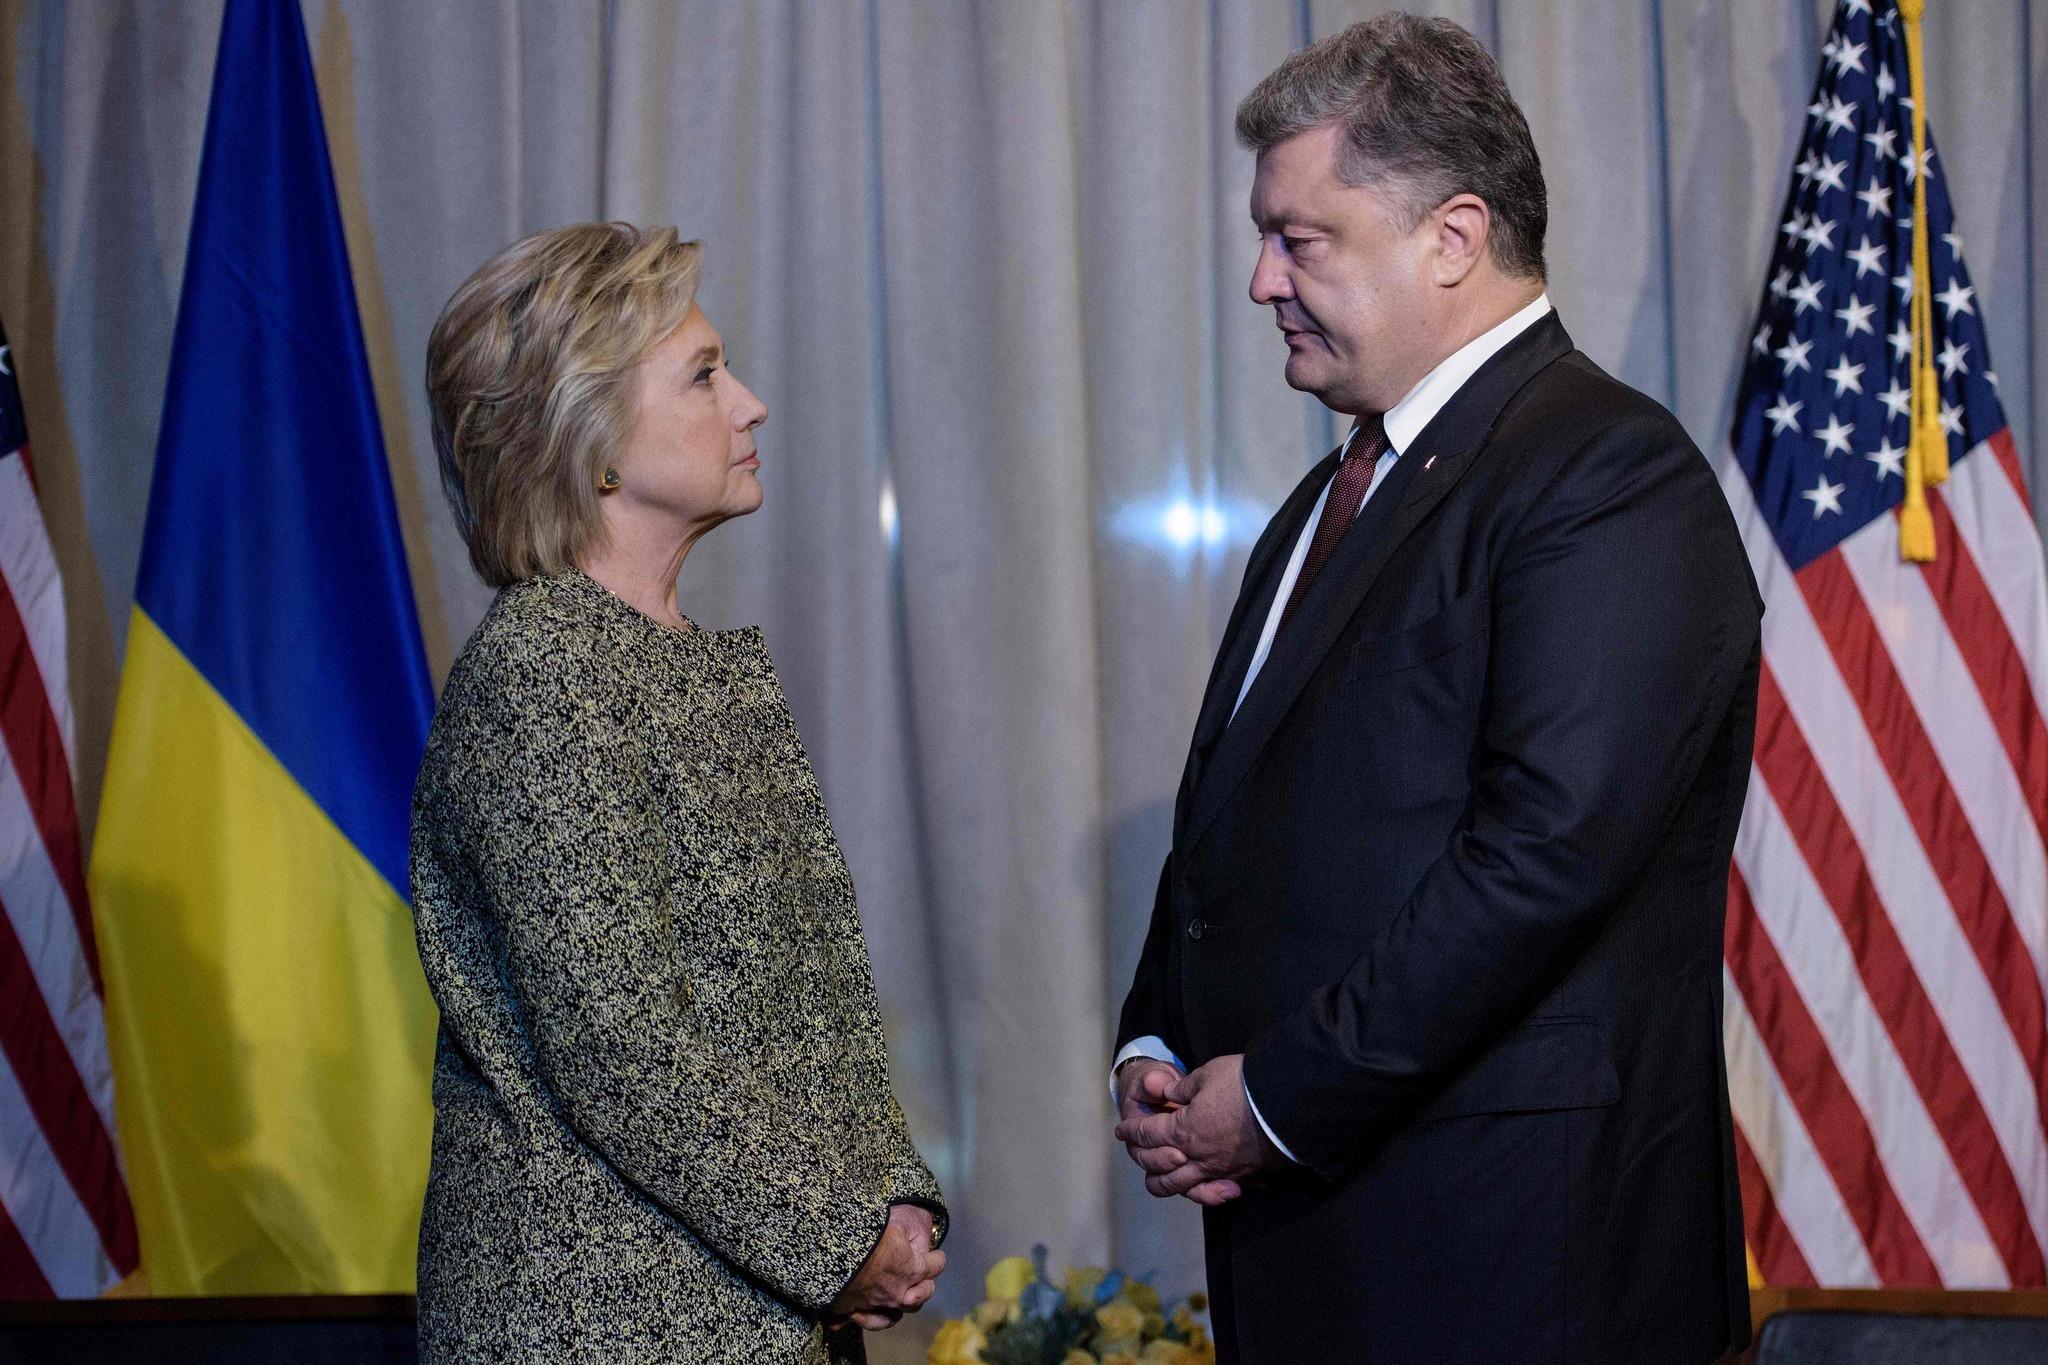 la-pol-us-ukraine-politics-vote-democrats-clinton-20160919